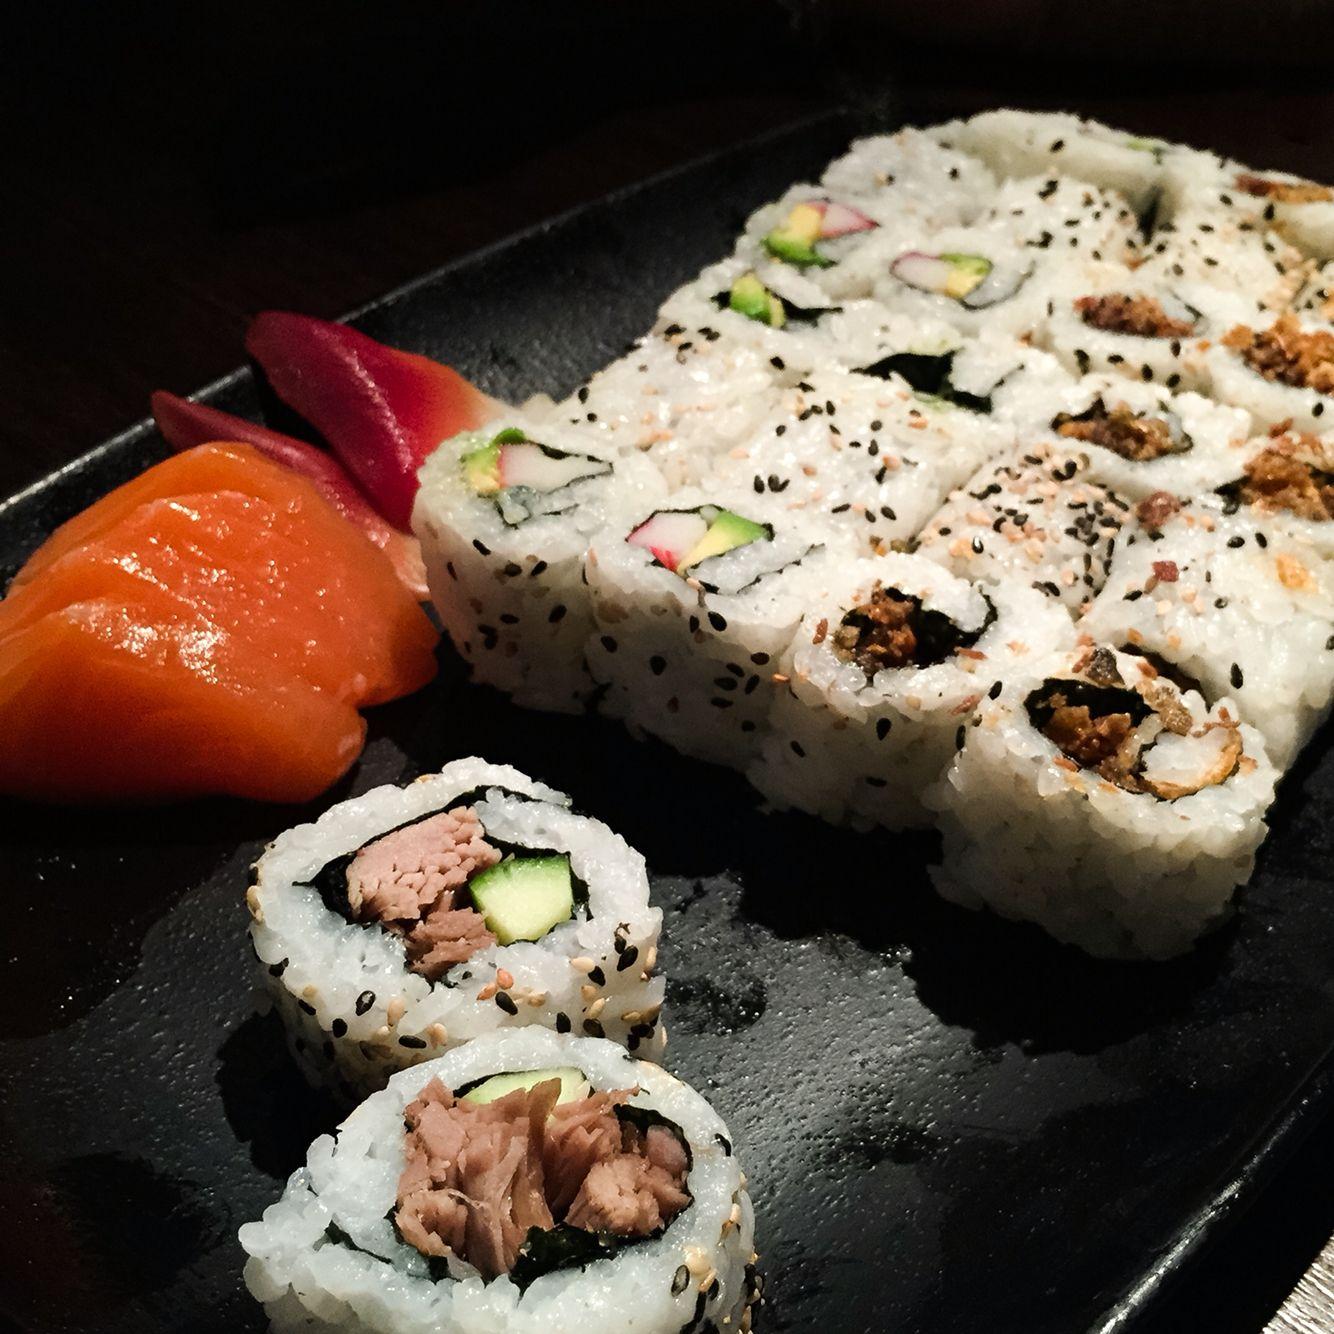 Salmon Sashimi, Salmon skin roll, Clam sashimi, Crispy